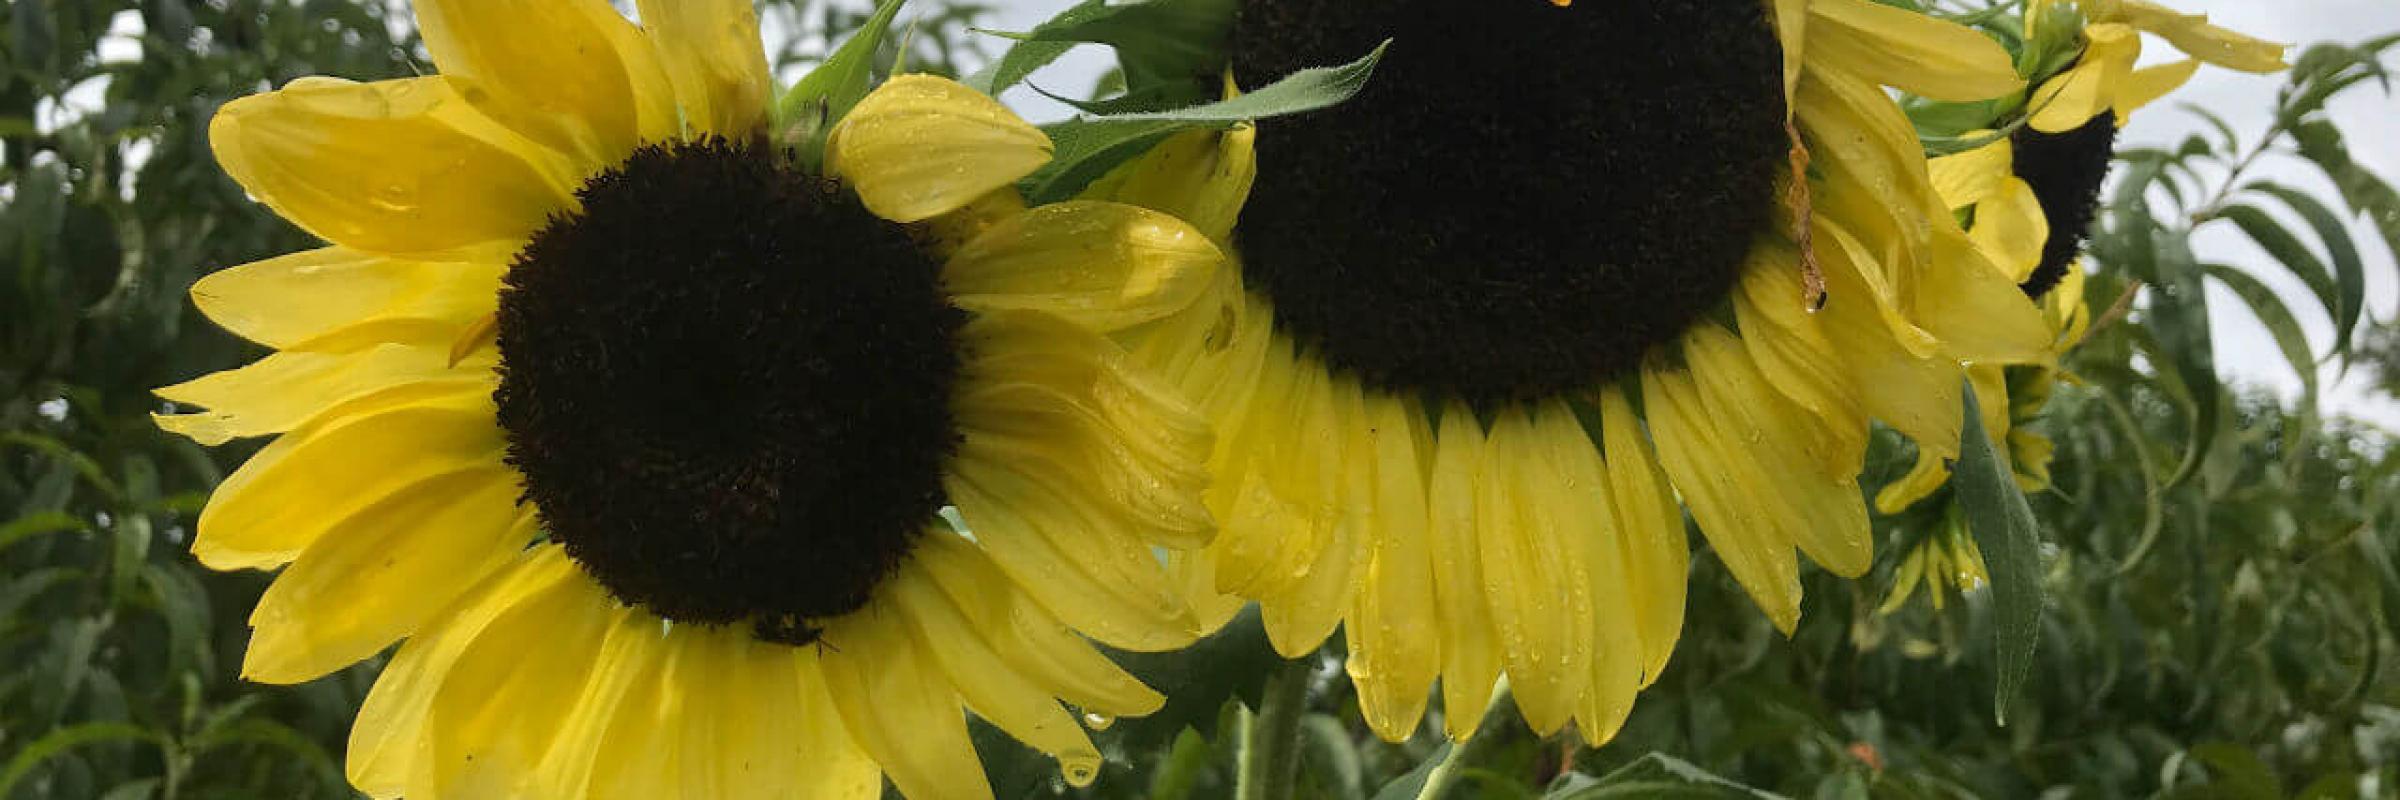 Garden sunflowers 2018